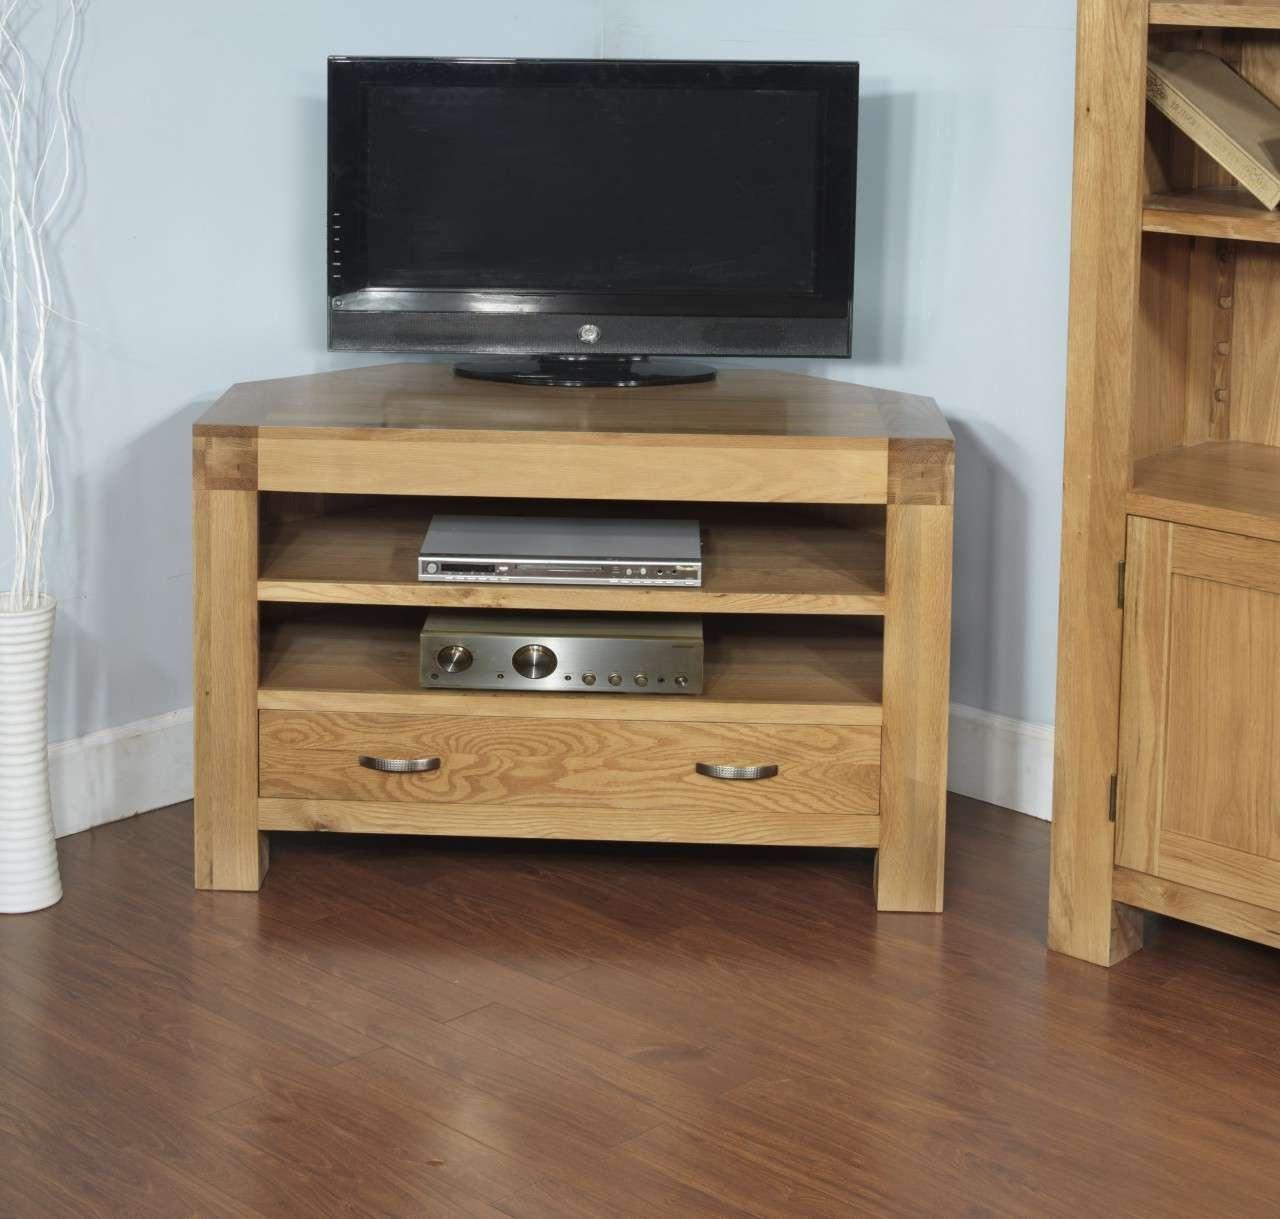 Rivermead Solid Oak Modern Furniture Widescreen Corner Tv Cabinet Throughout Contemporary Oak Tv Stands (View 8 of 15)